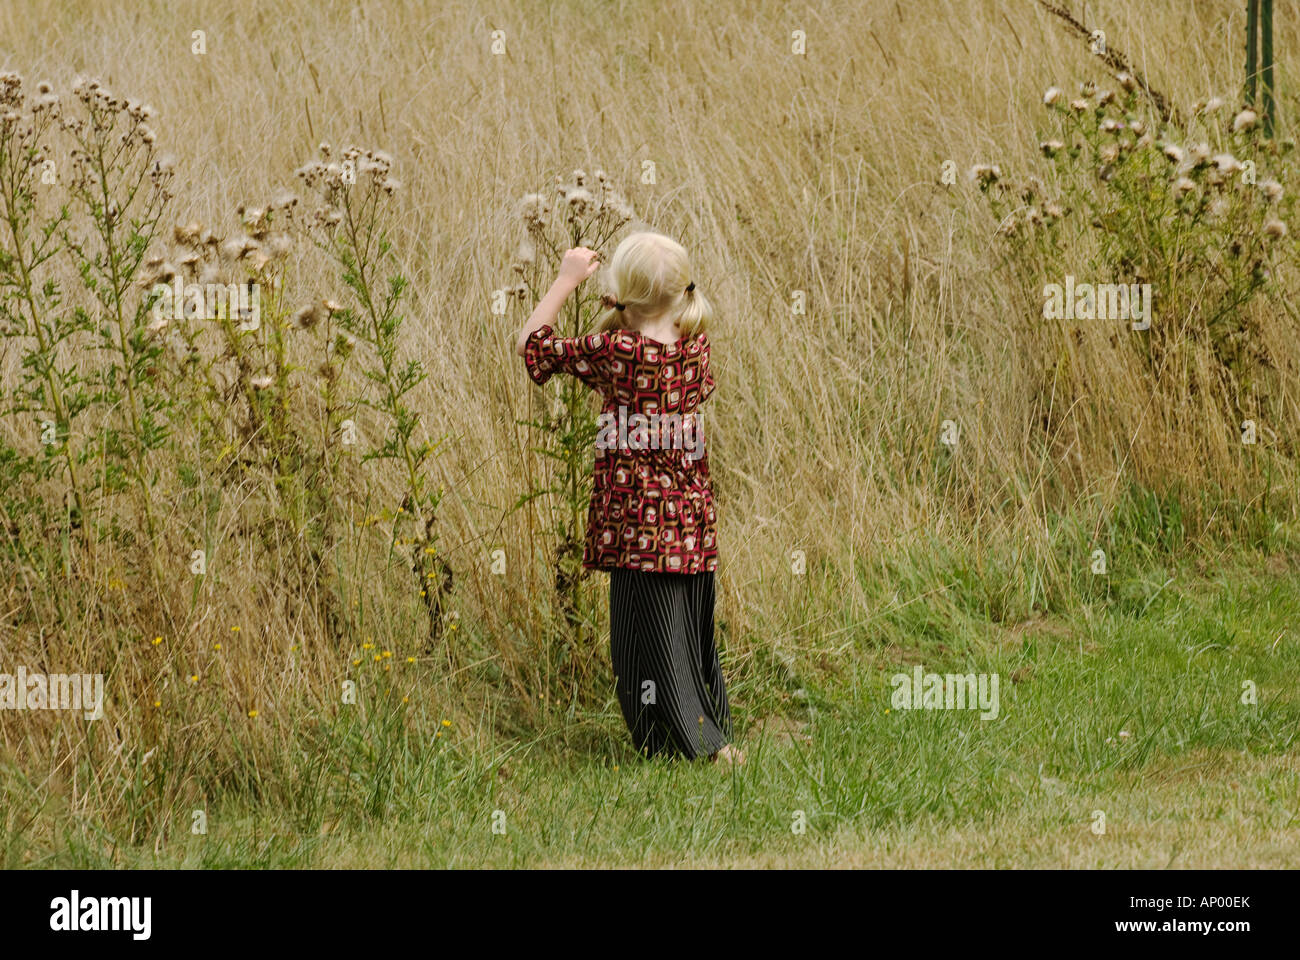 Skirted Stock Photos & Skirted Stock Images - Alamy